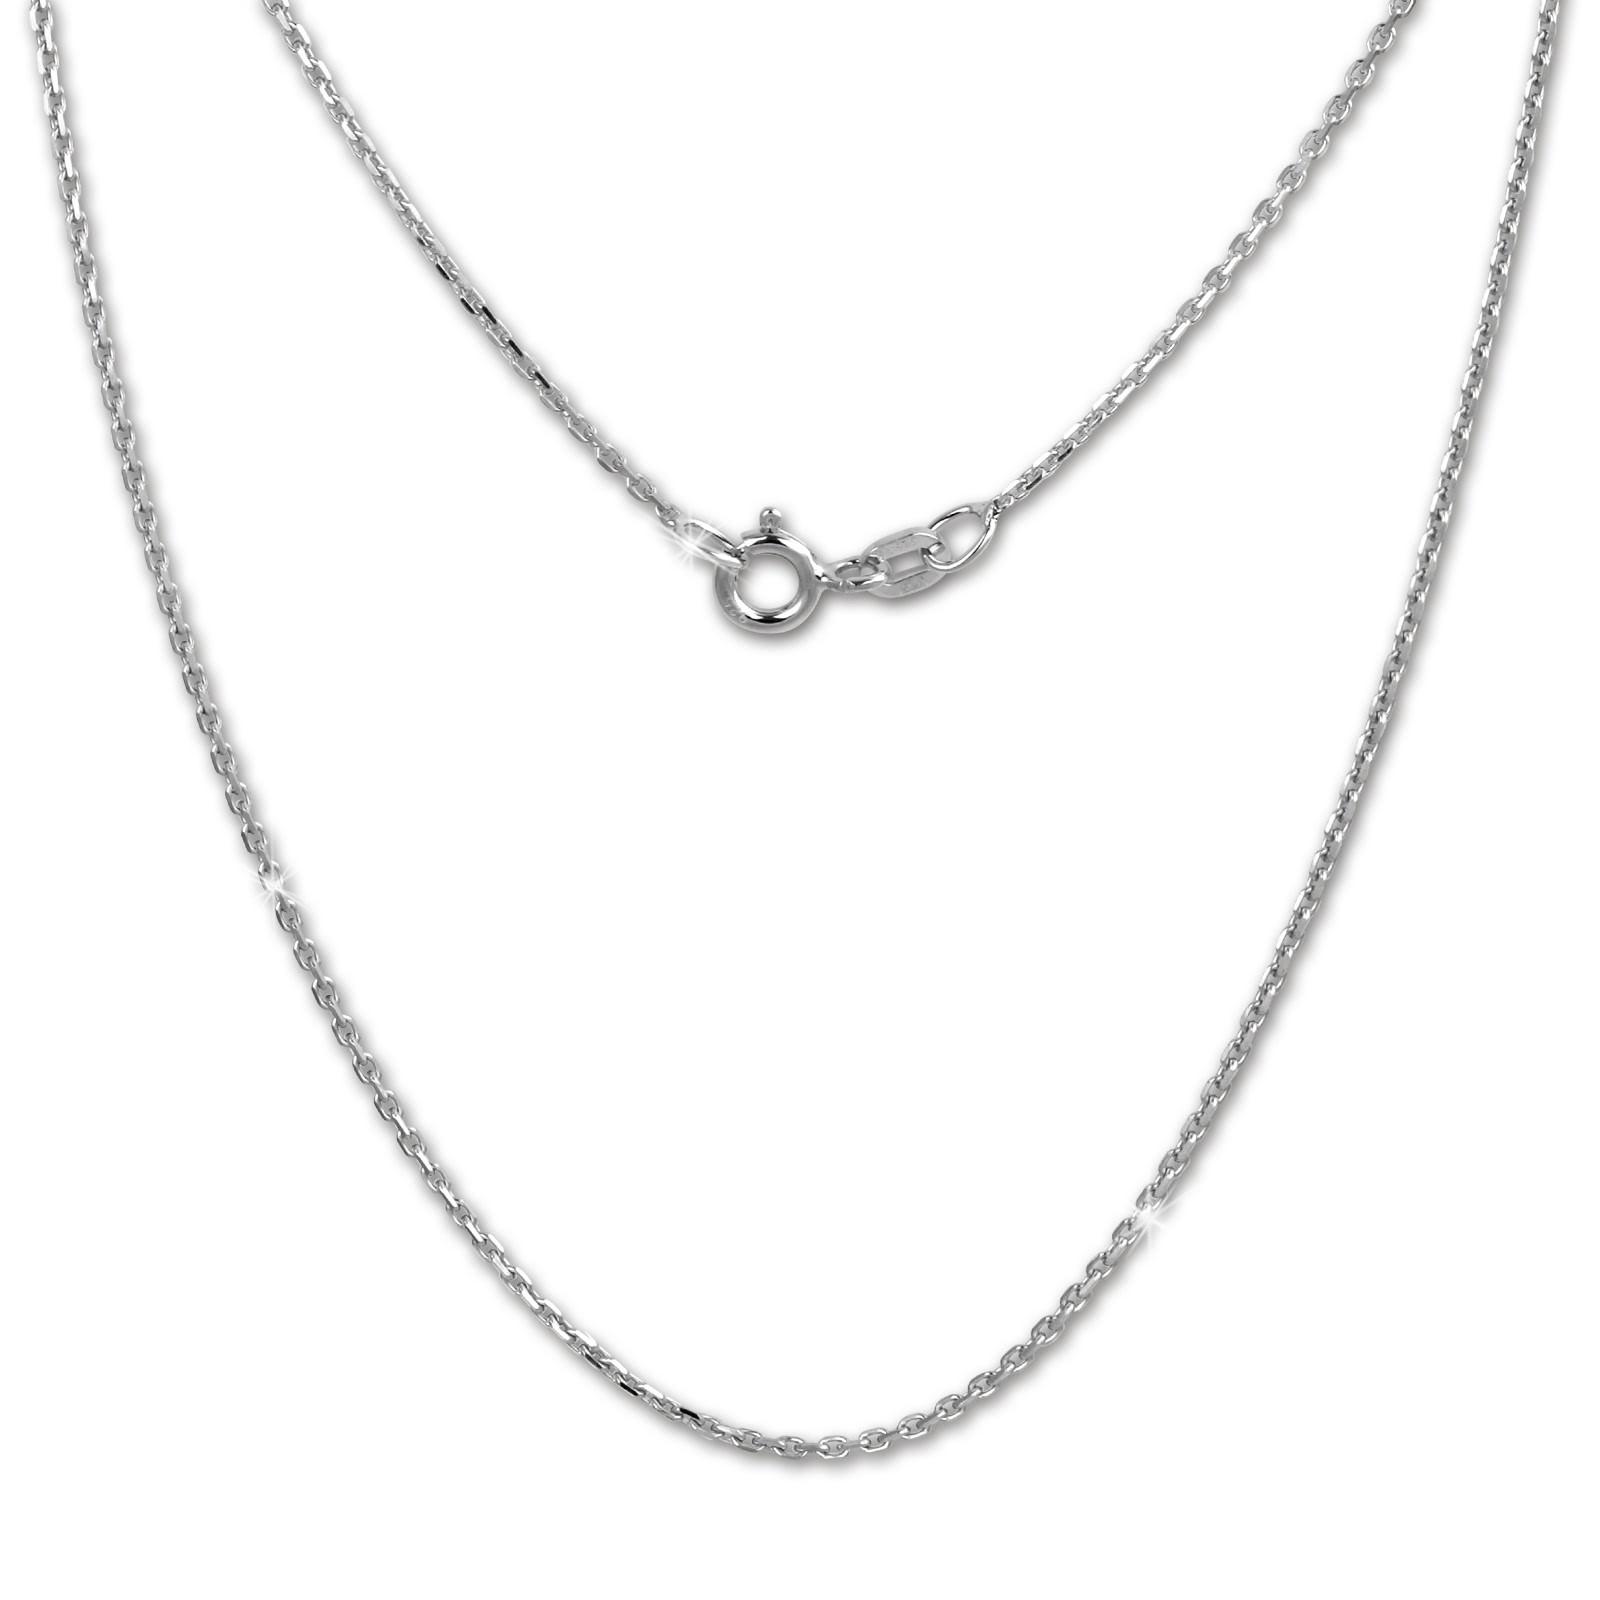 SilberDream Kette Anker diamantiert 925er Silber 50cm Damen Halskette SDK28950J